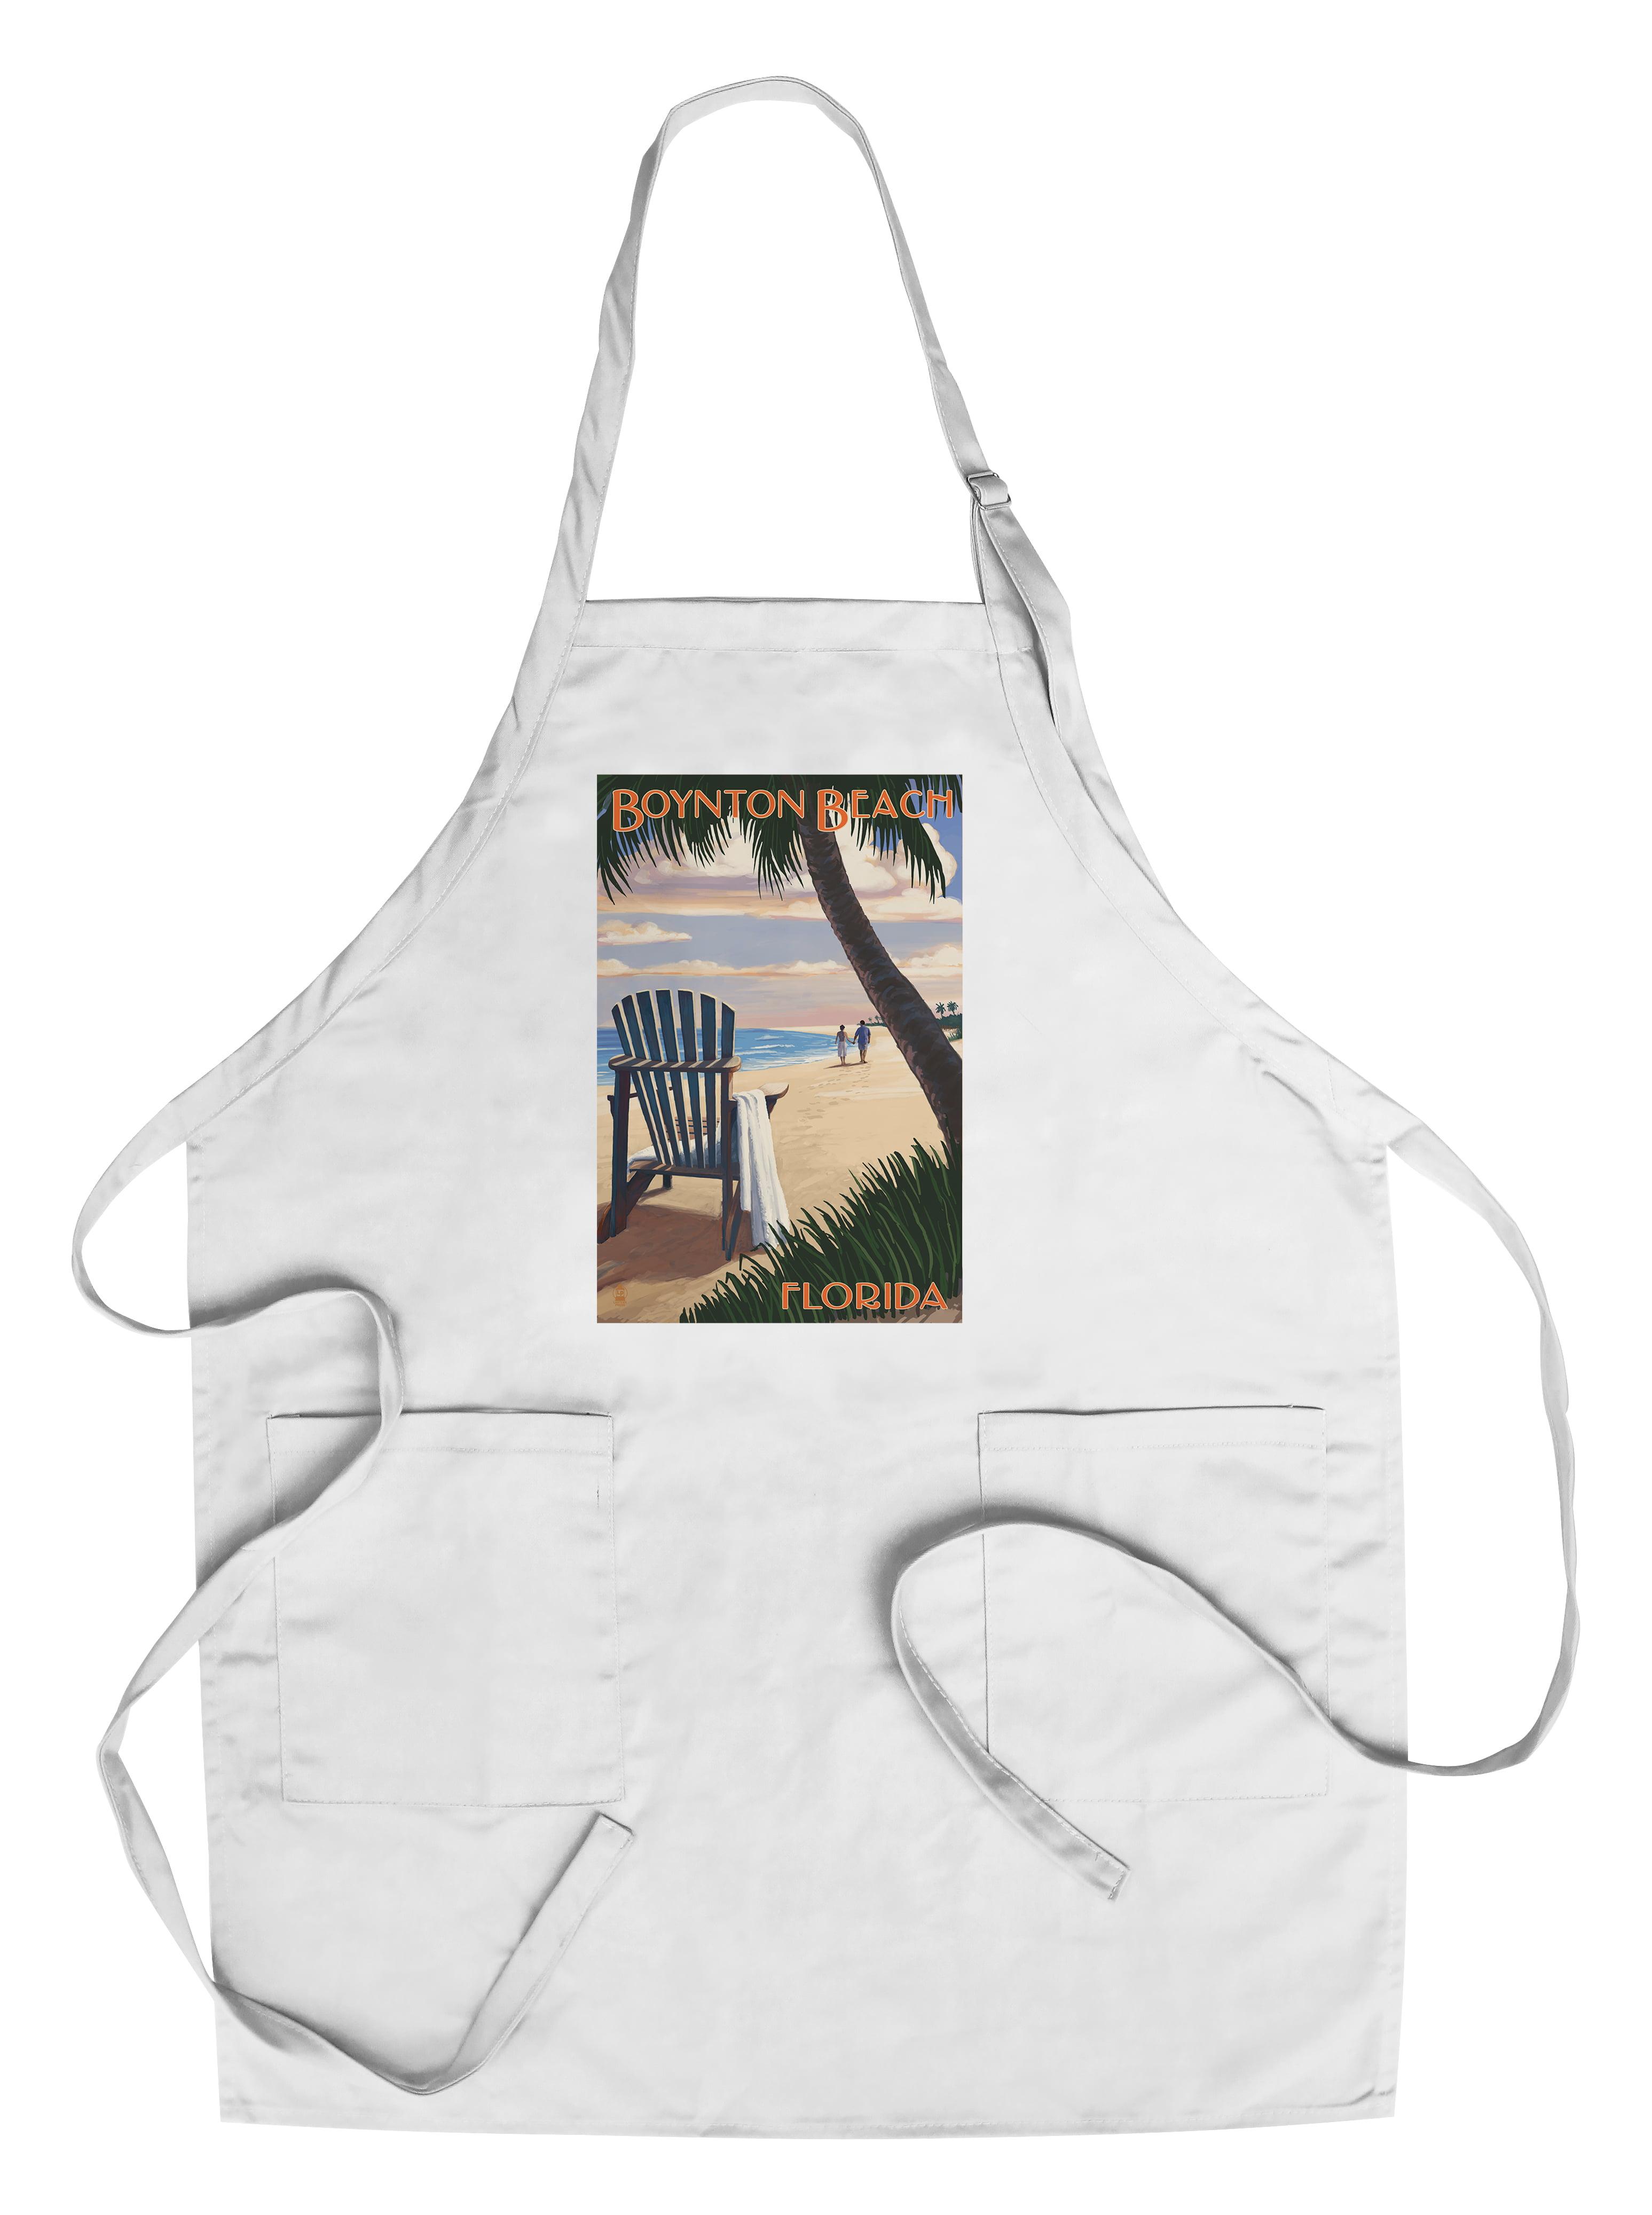 Boynton Beach, Florida Adirondack Chair on the Beach Lantern Press Poster (Cotton Polyester Chef's Apron) by Lantern Press